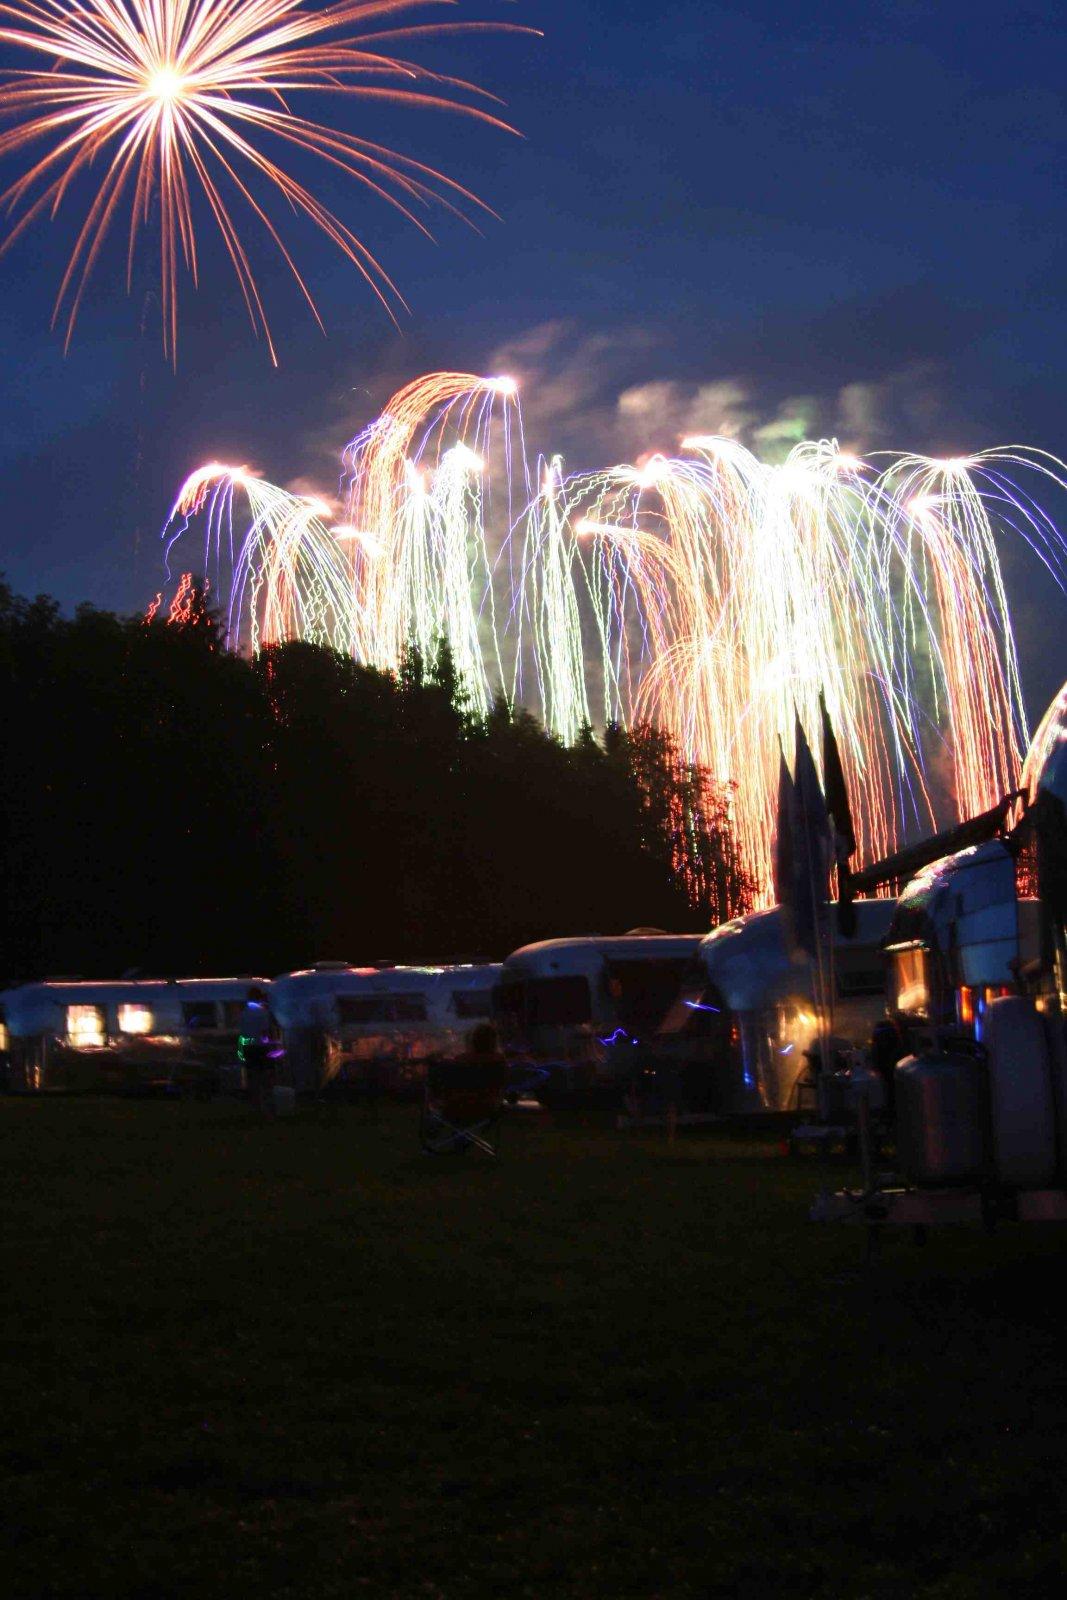 Click image for larger version  Name:bash fireworks1.jpg Views:186 Size:227.6 KB ID:105762